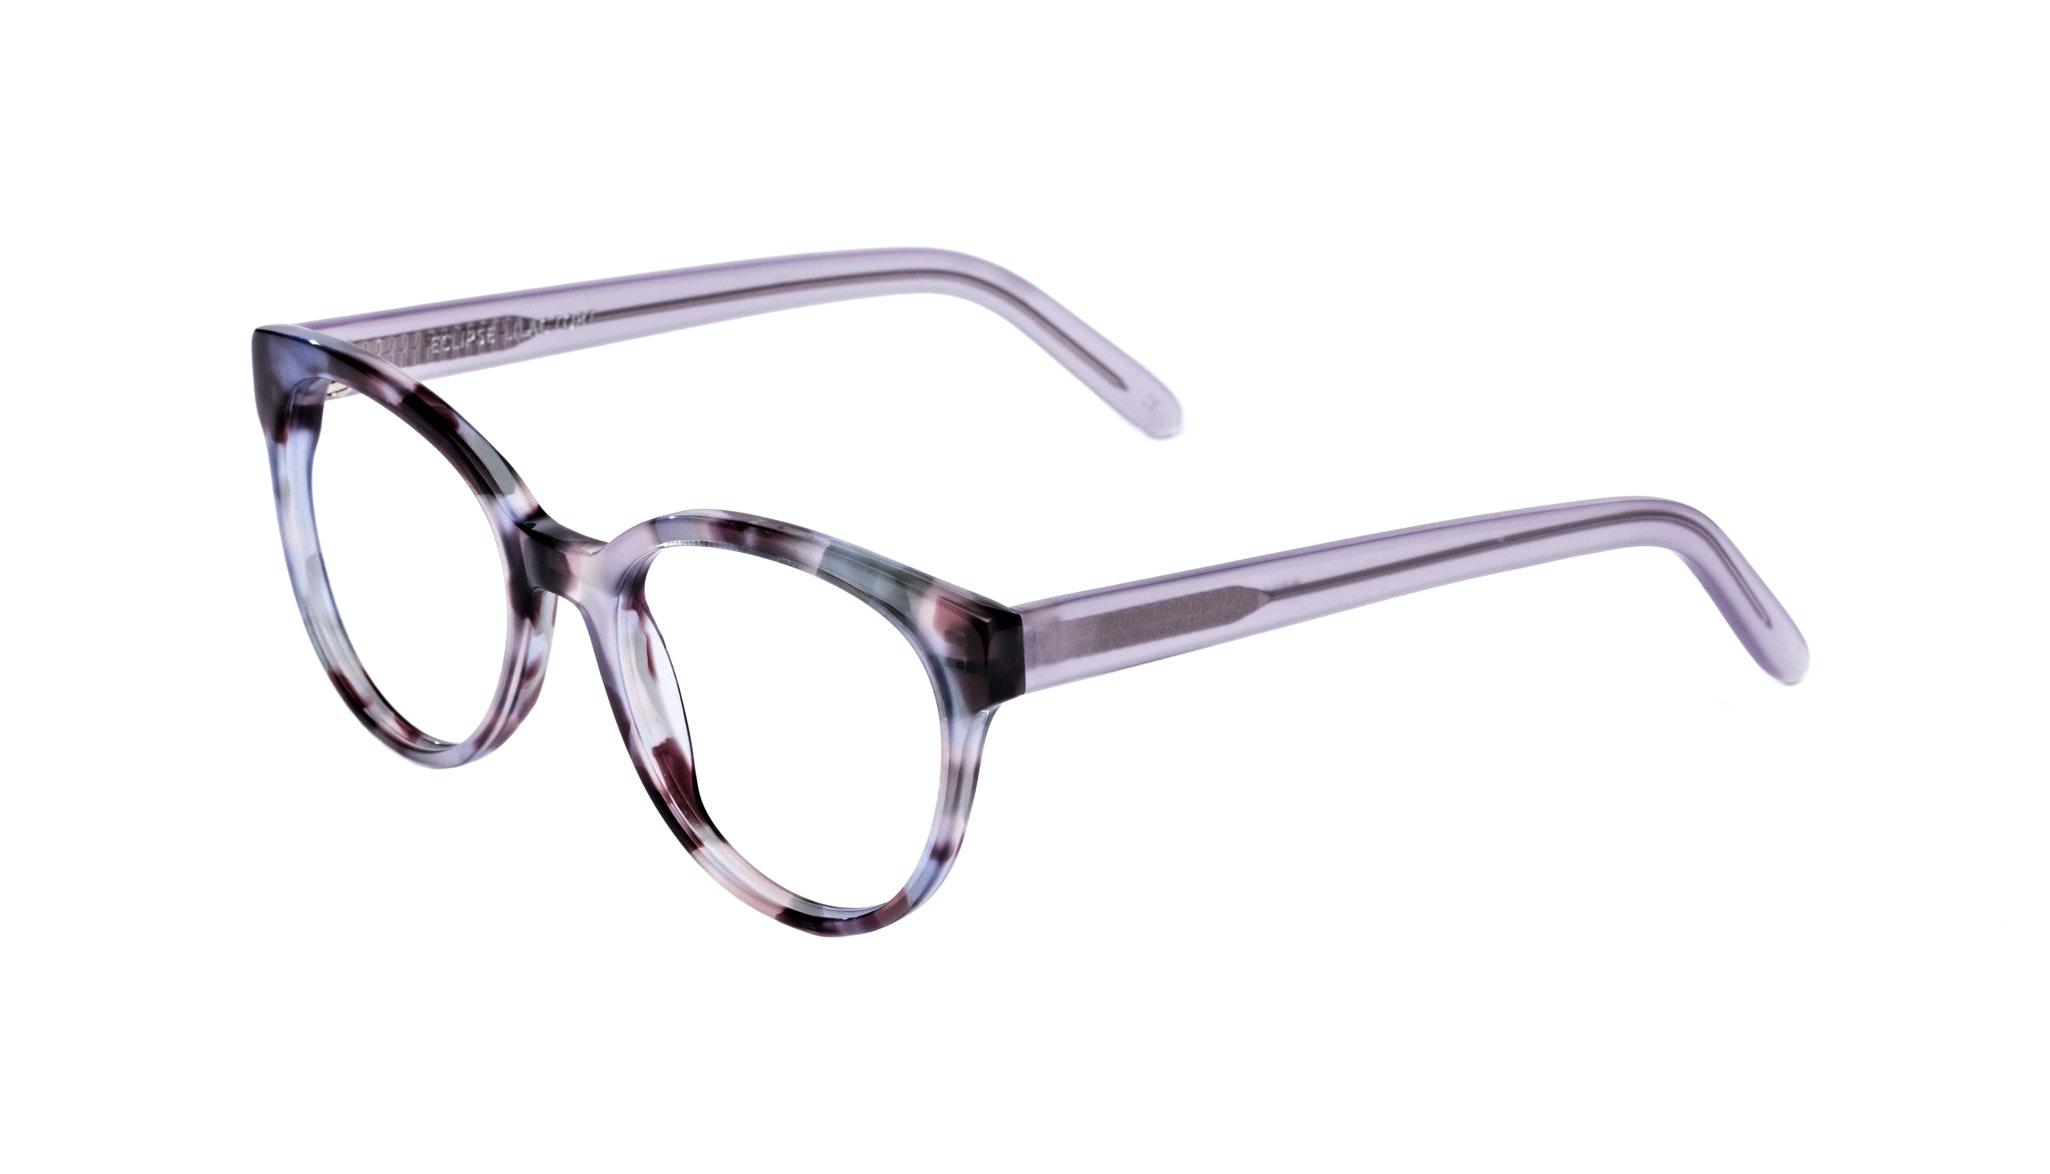 Affordable Fashion Glasses Cat Eye Round Eyeglasses Women Eclipse Lilac Tort Tilt